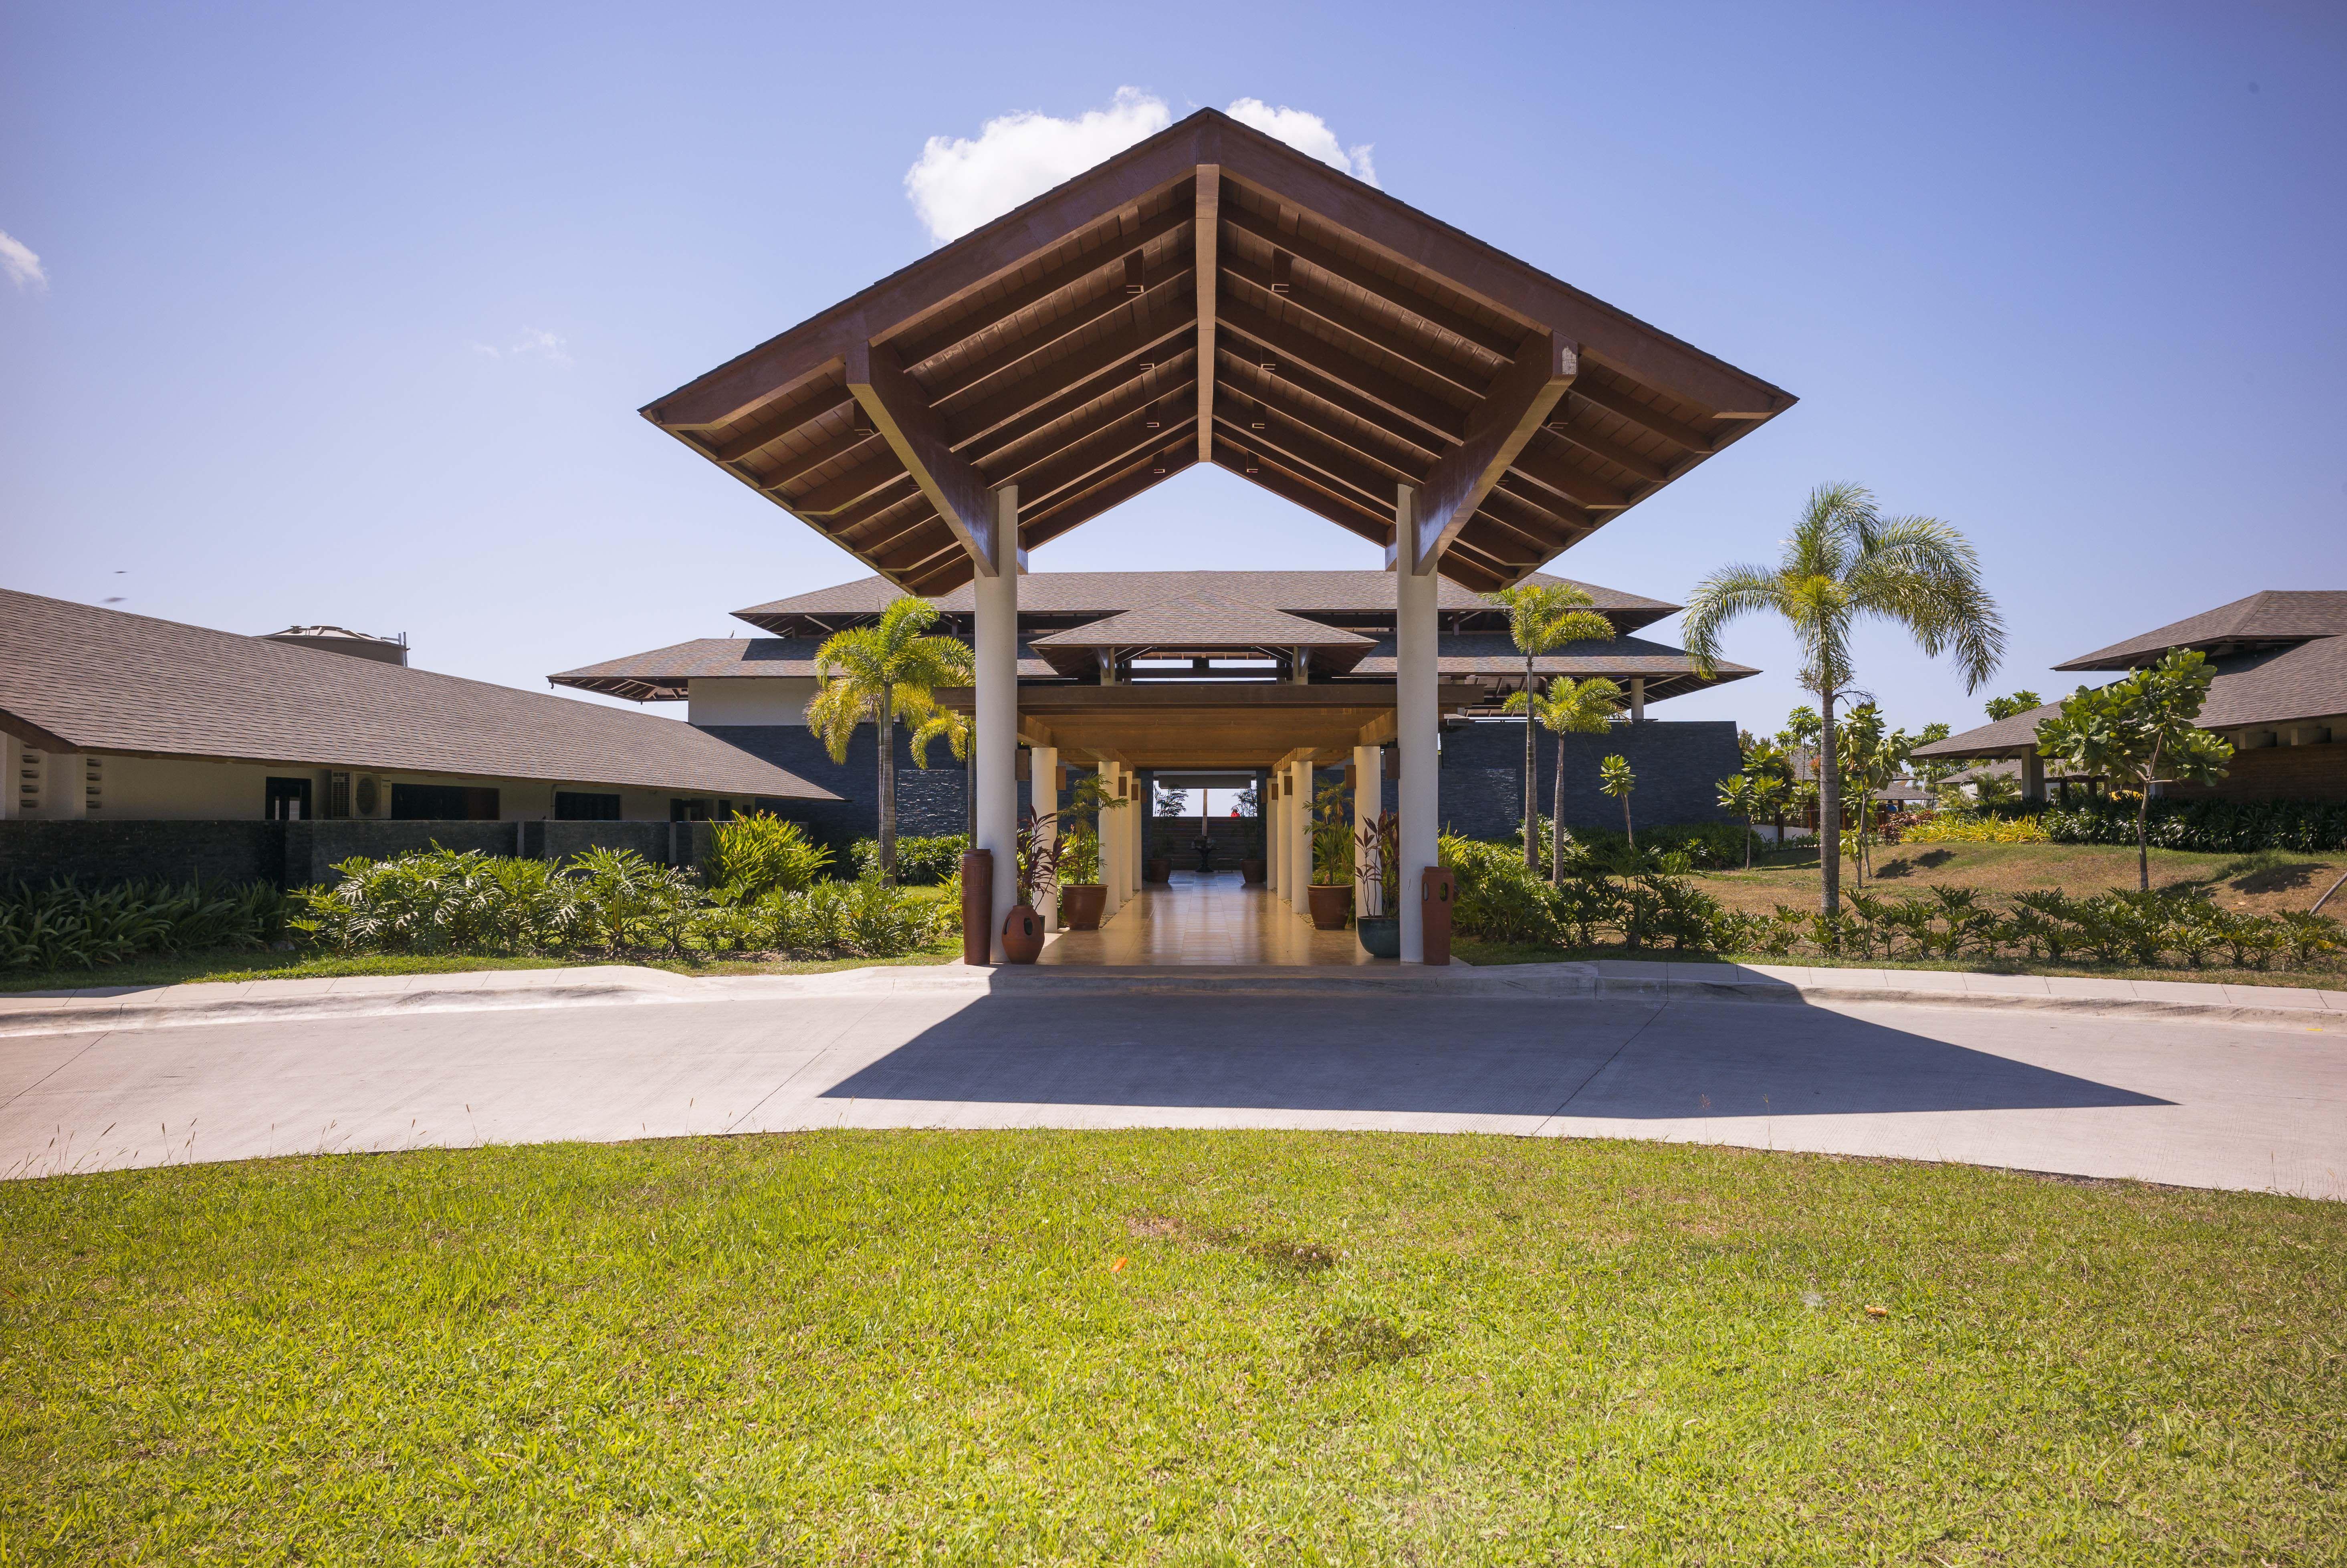 Playa Laiya Entrance Outdoor Structures Outdoor Gazebo